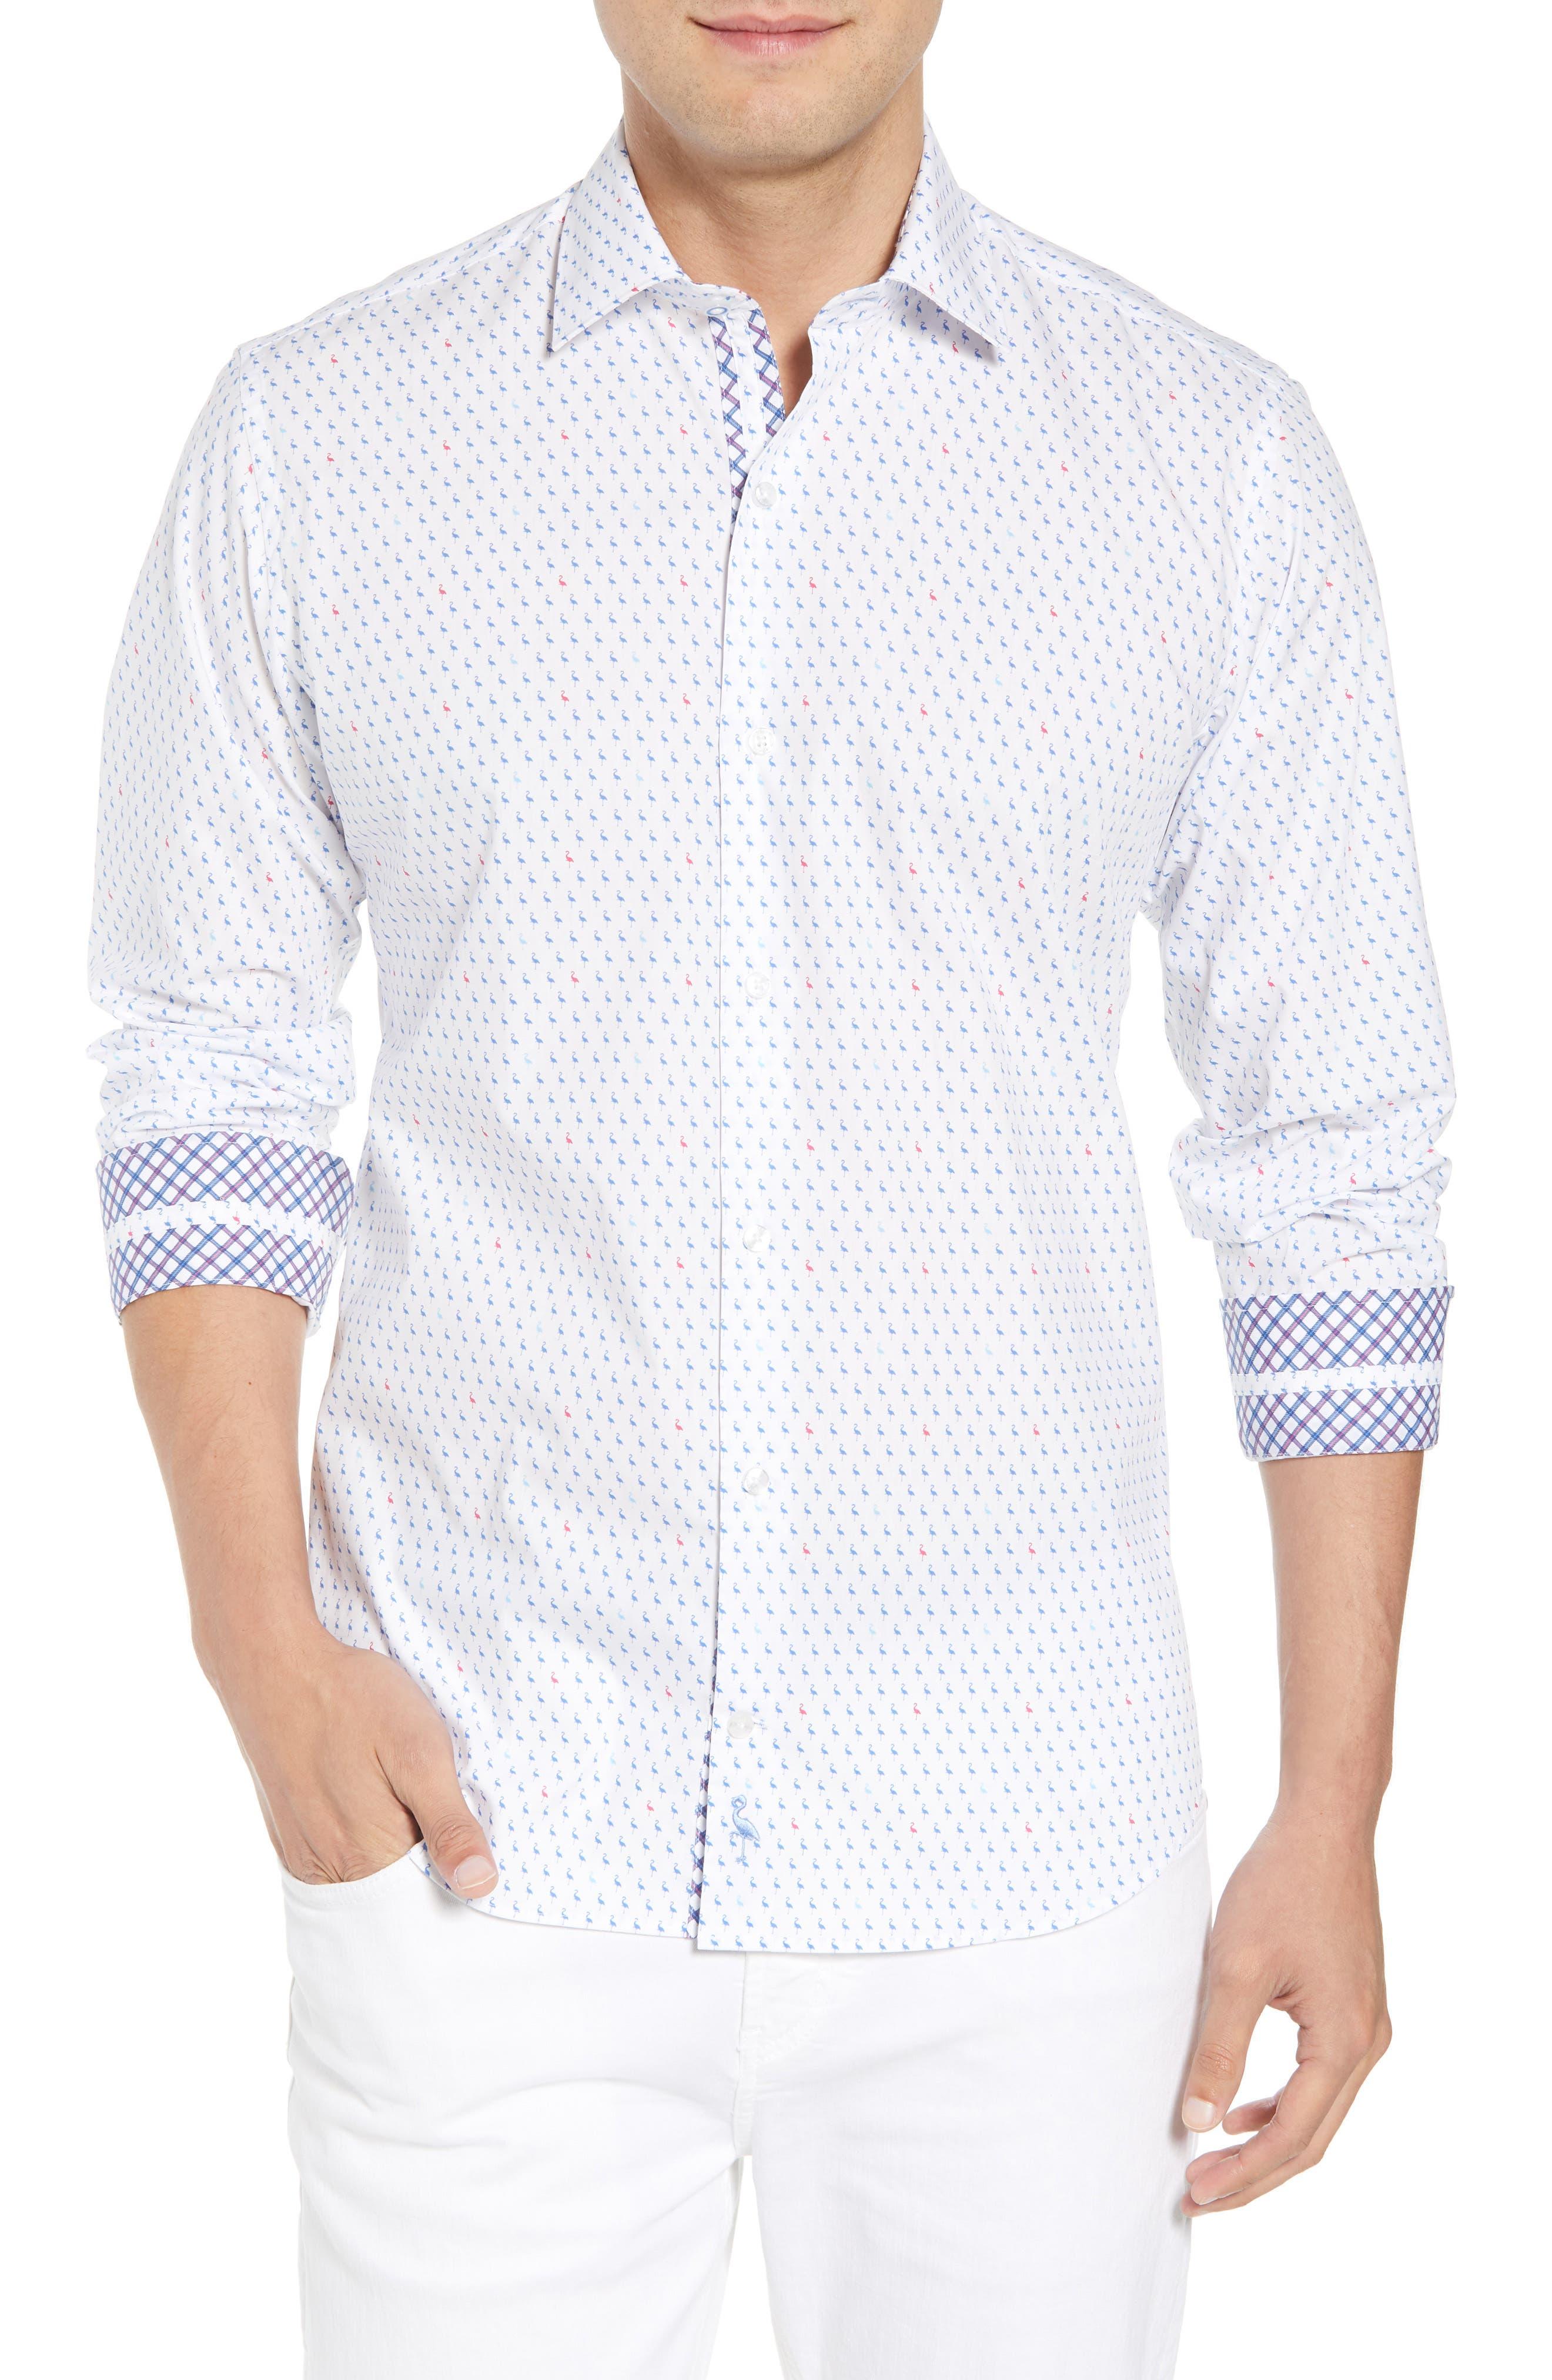 Auden Regular Fit Print Sport Shirt,                         Main,                         color, Peri Blue